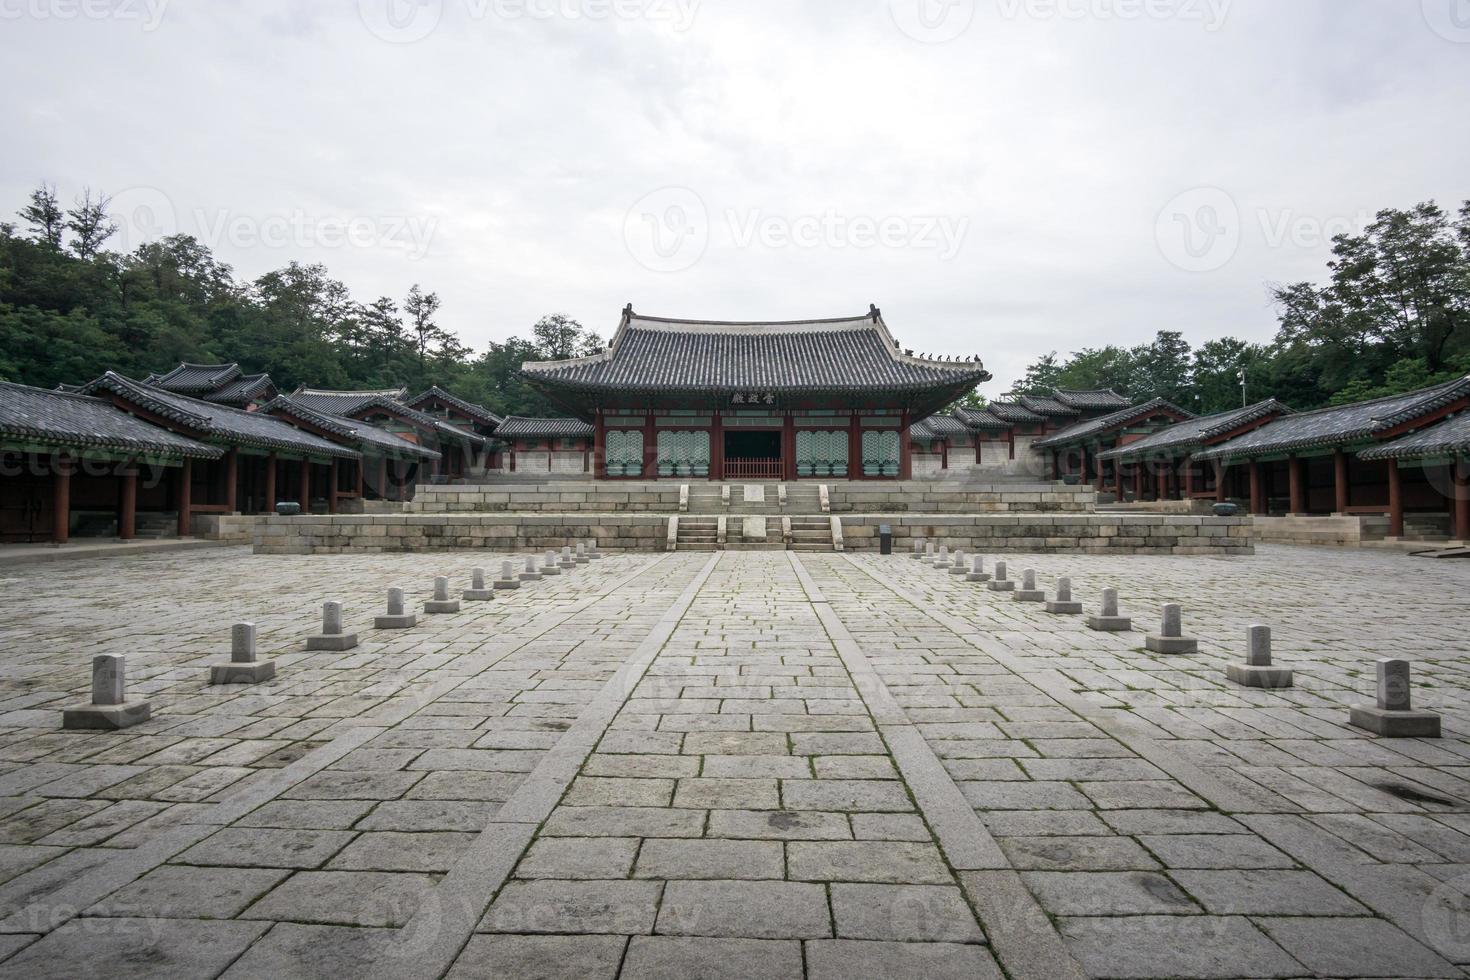 Gyeonghui gung Palace Scenery photo